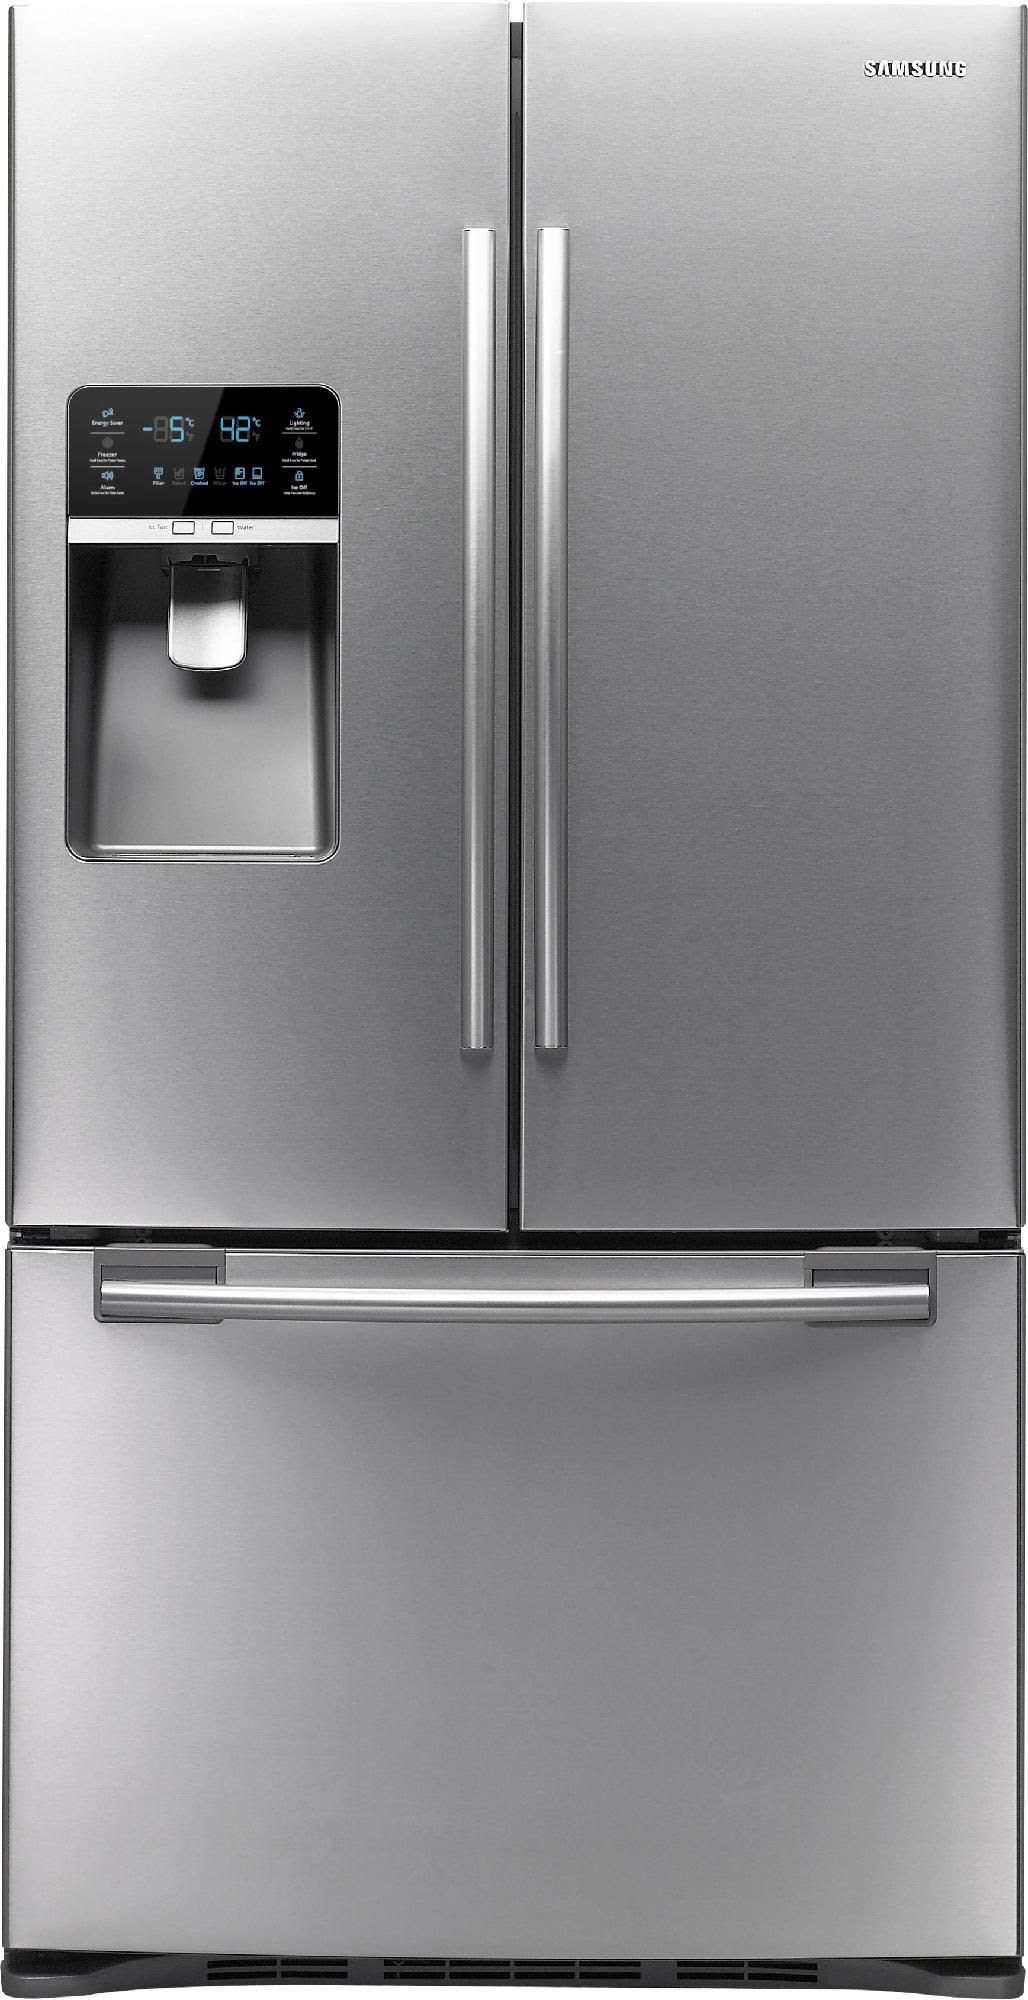 Samsung 33 Inch Wide French Door Refrigerator Home Design Ideas